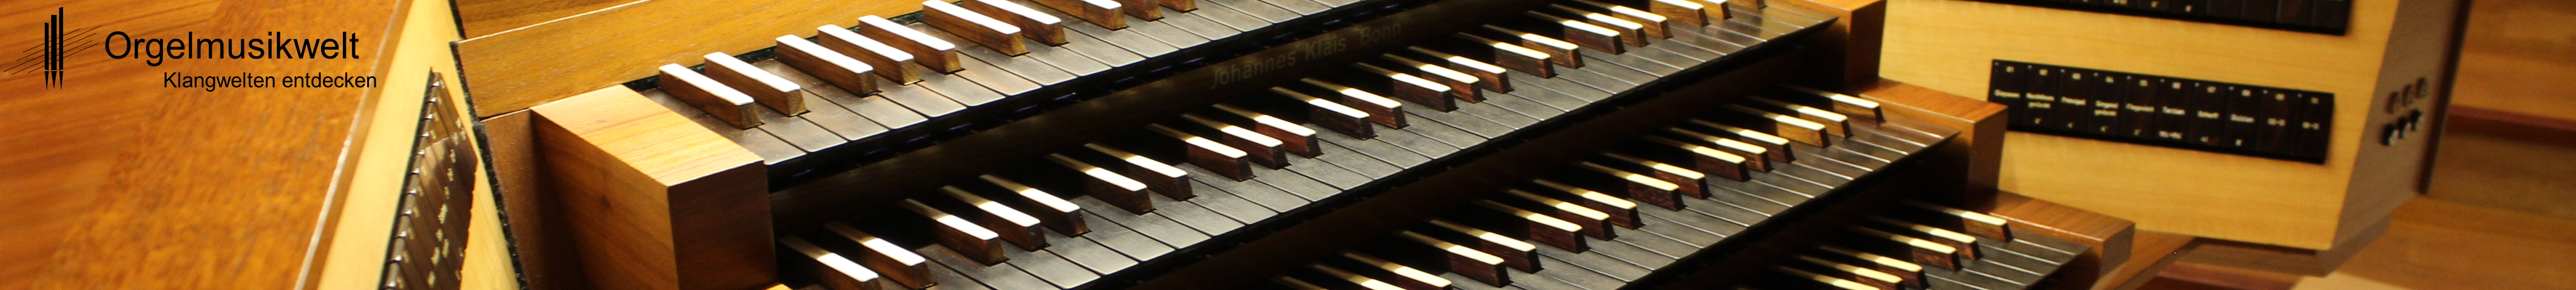 Orgelmusikwelt.de